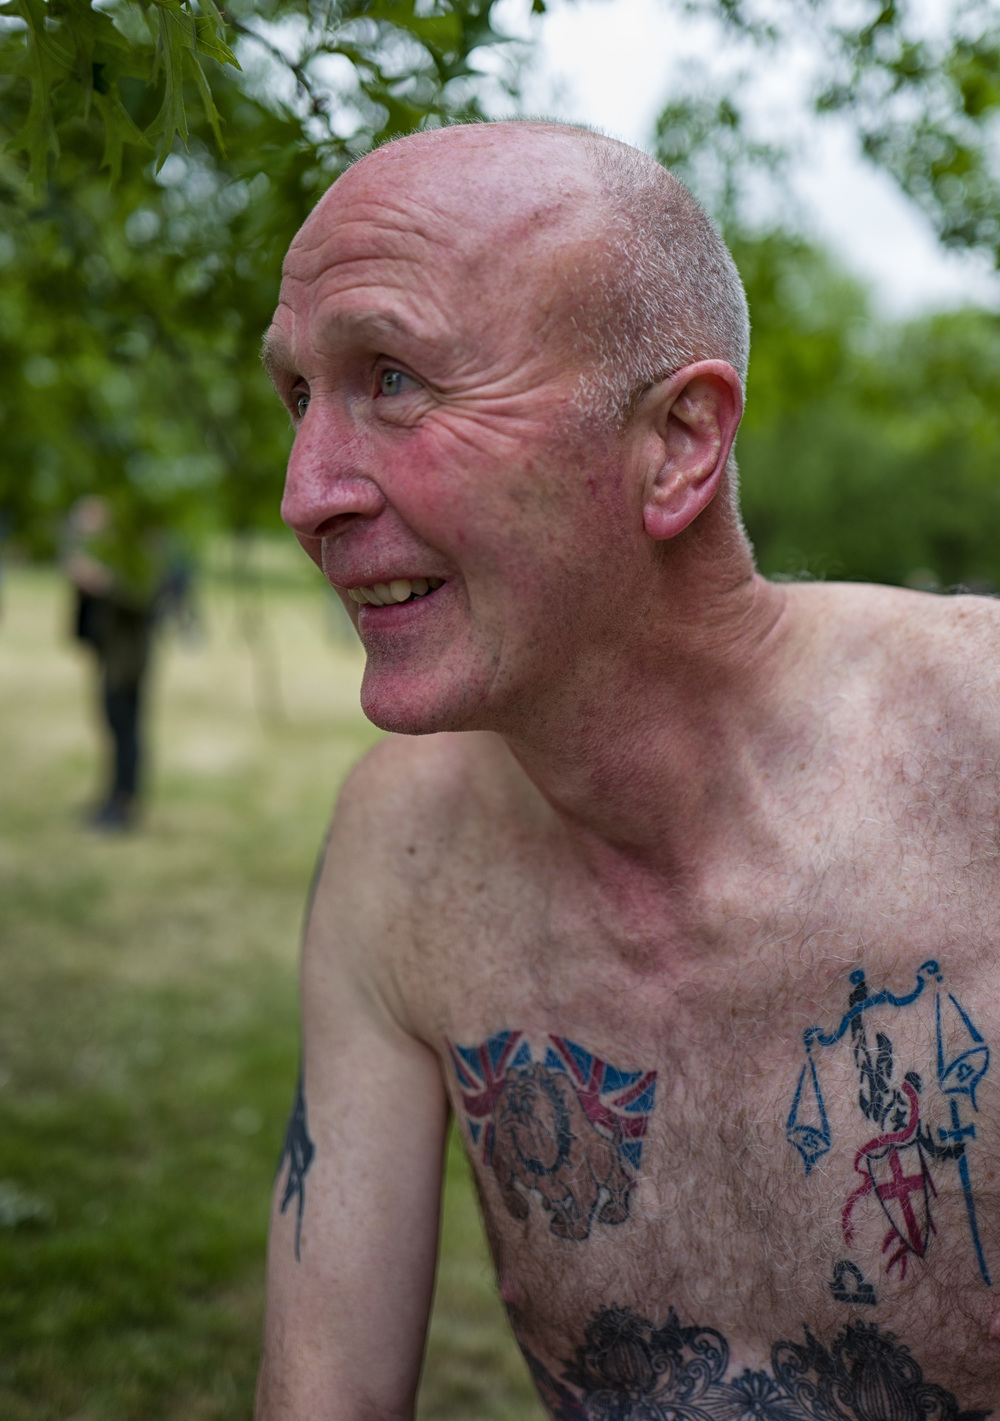 Bulldog spirit, veteran of many naked bike rides